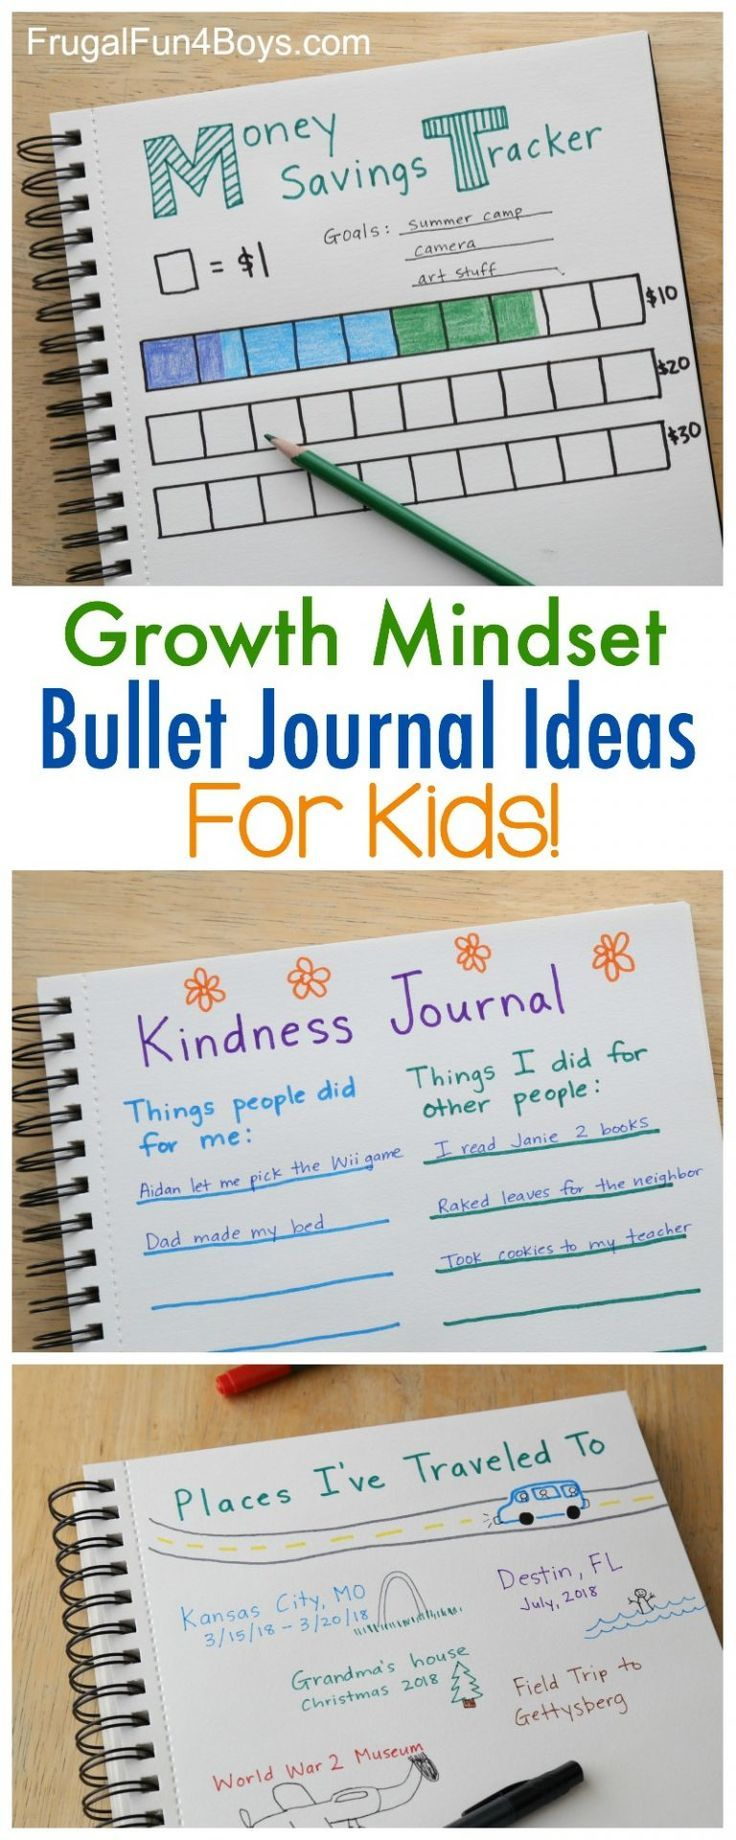 Growth Mindset Bullet Journal Ideas For Kids Ils